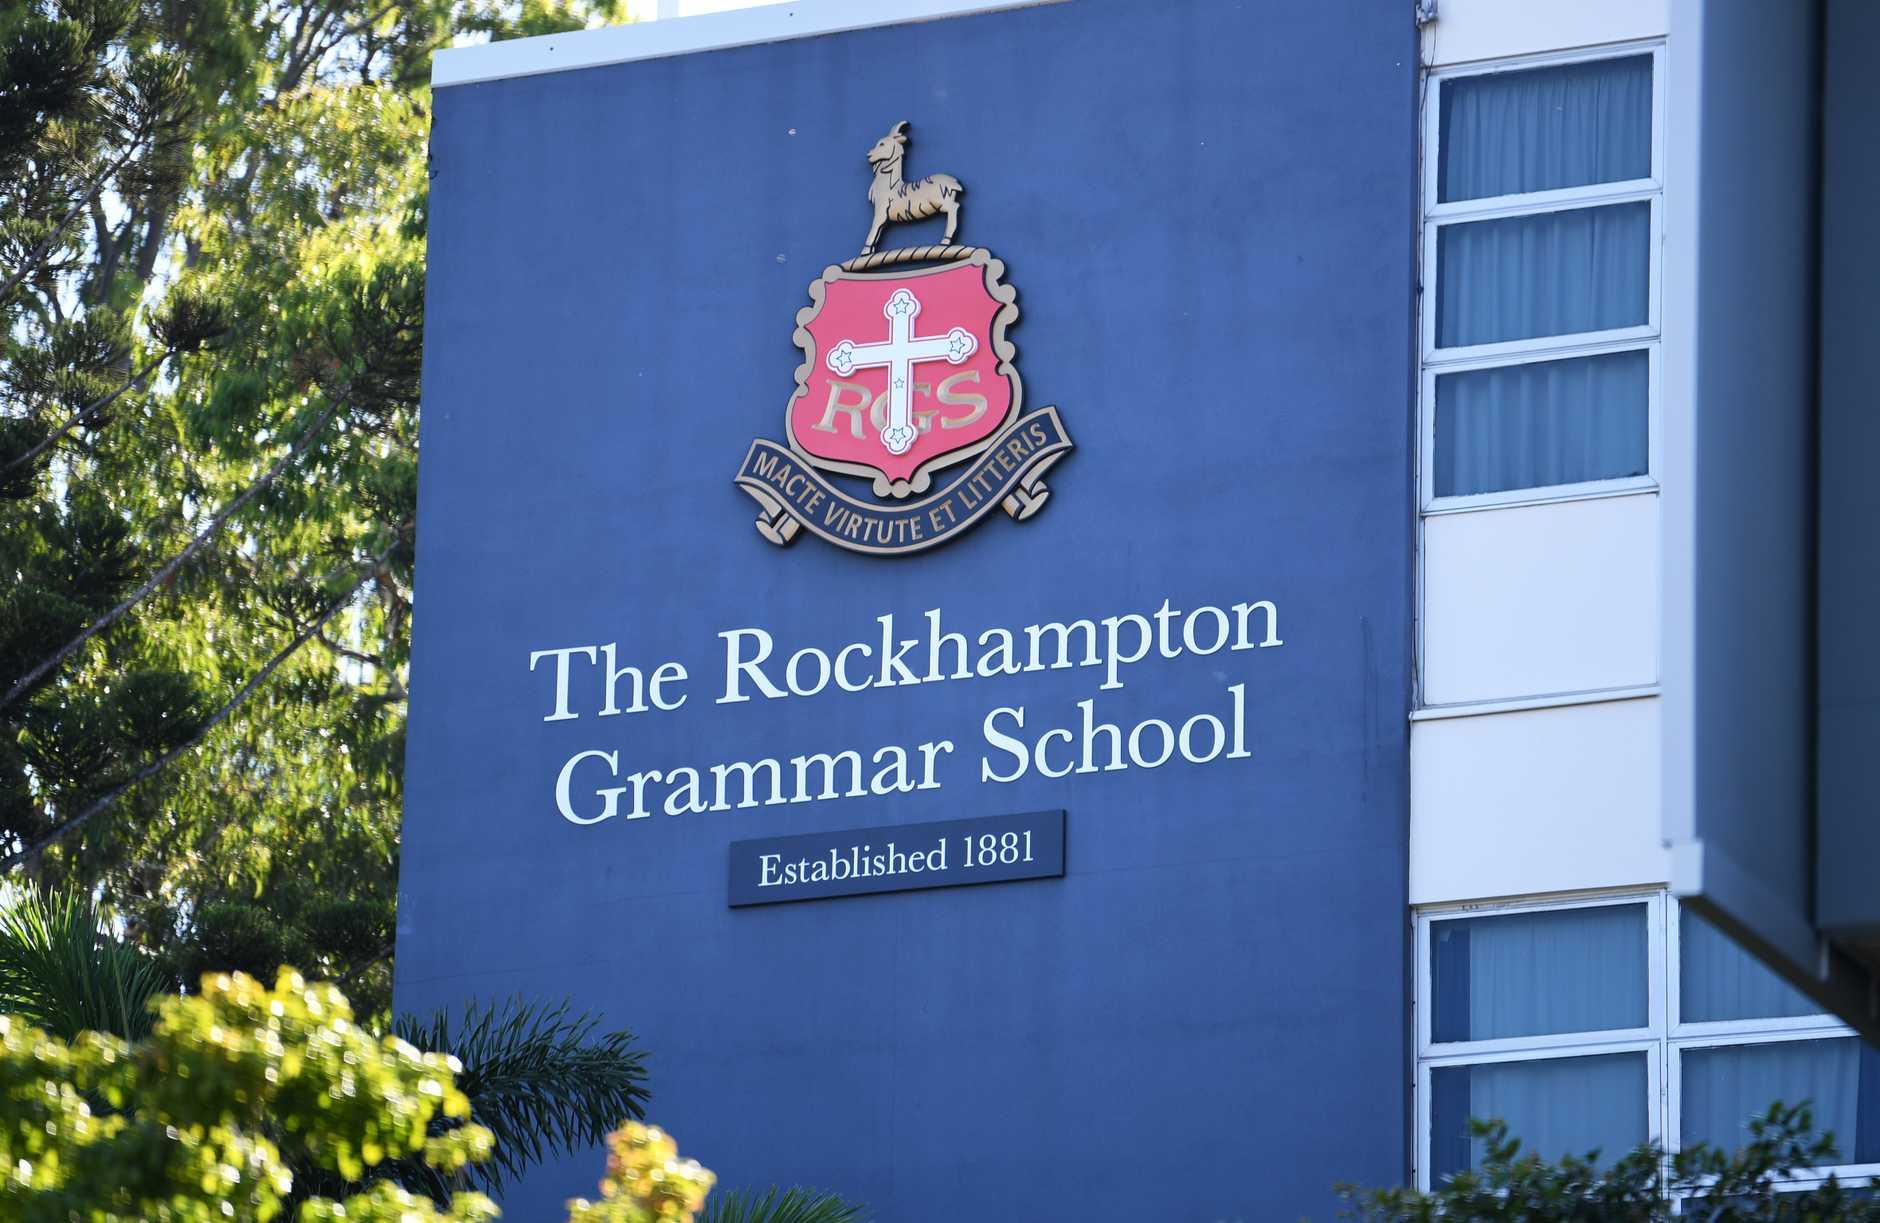 Rockhampton Grammar School. PHOTO: Allan Reinikka